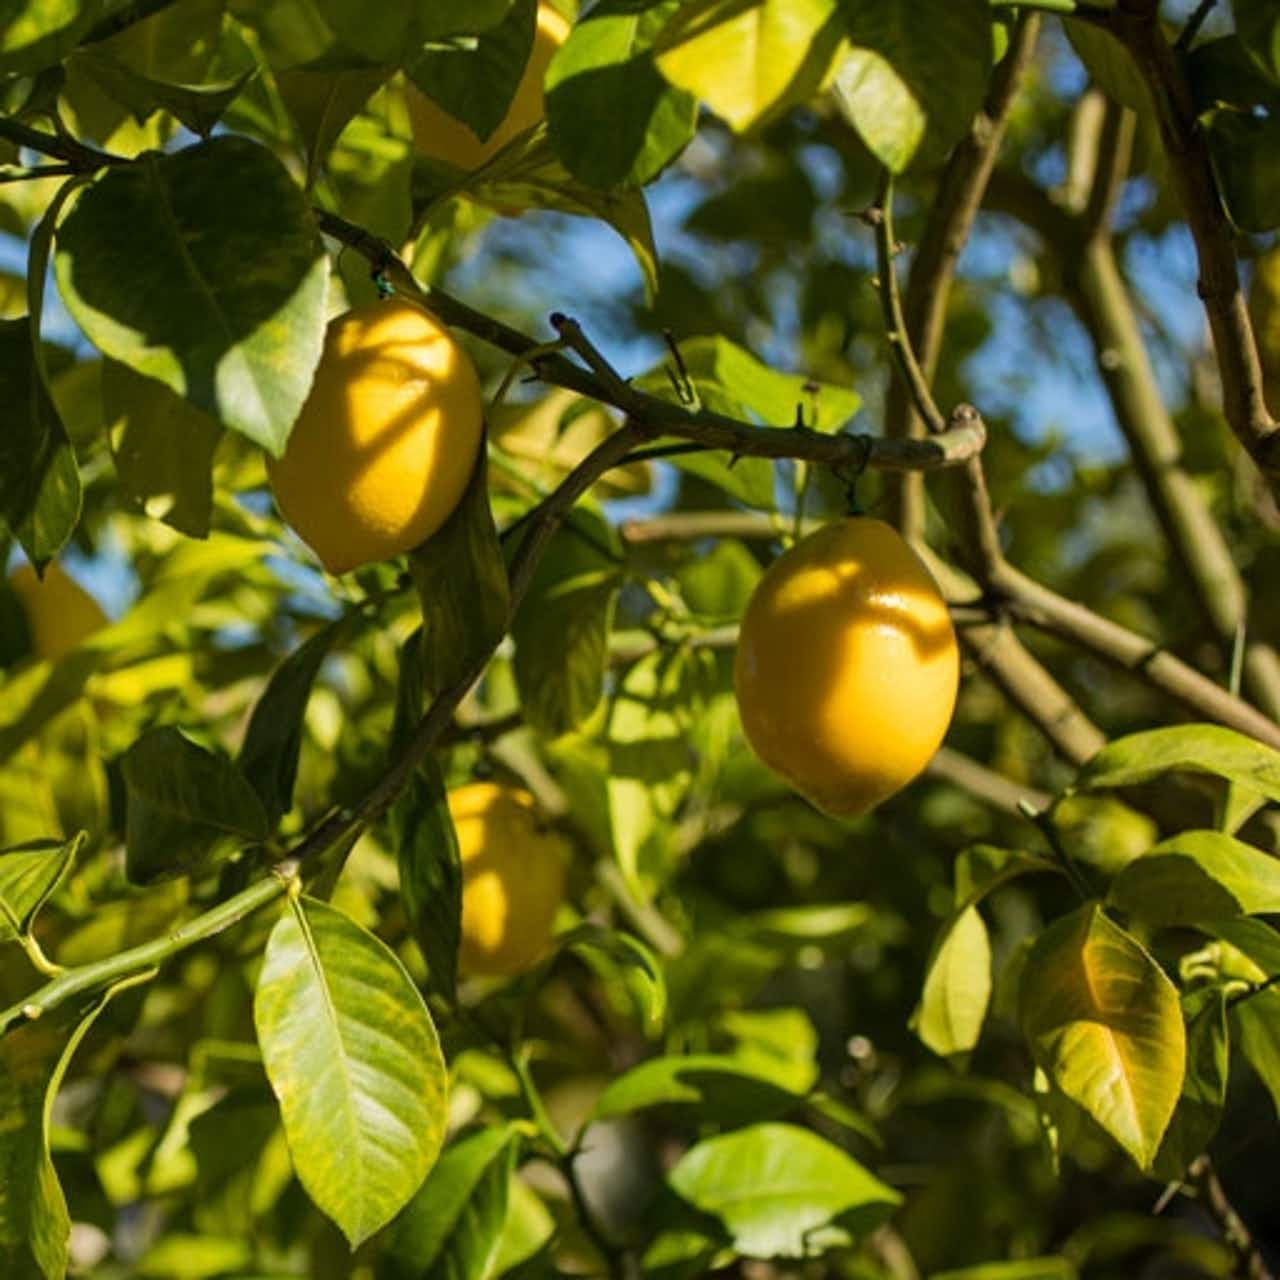 Wertvolle, biologisch angebauten Inhaltsstoffe